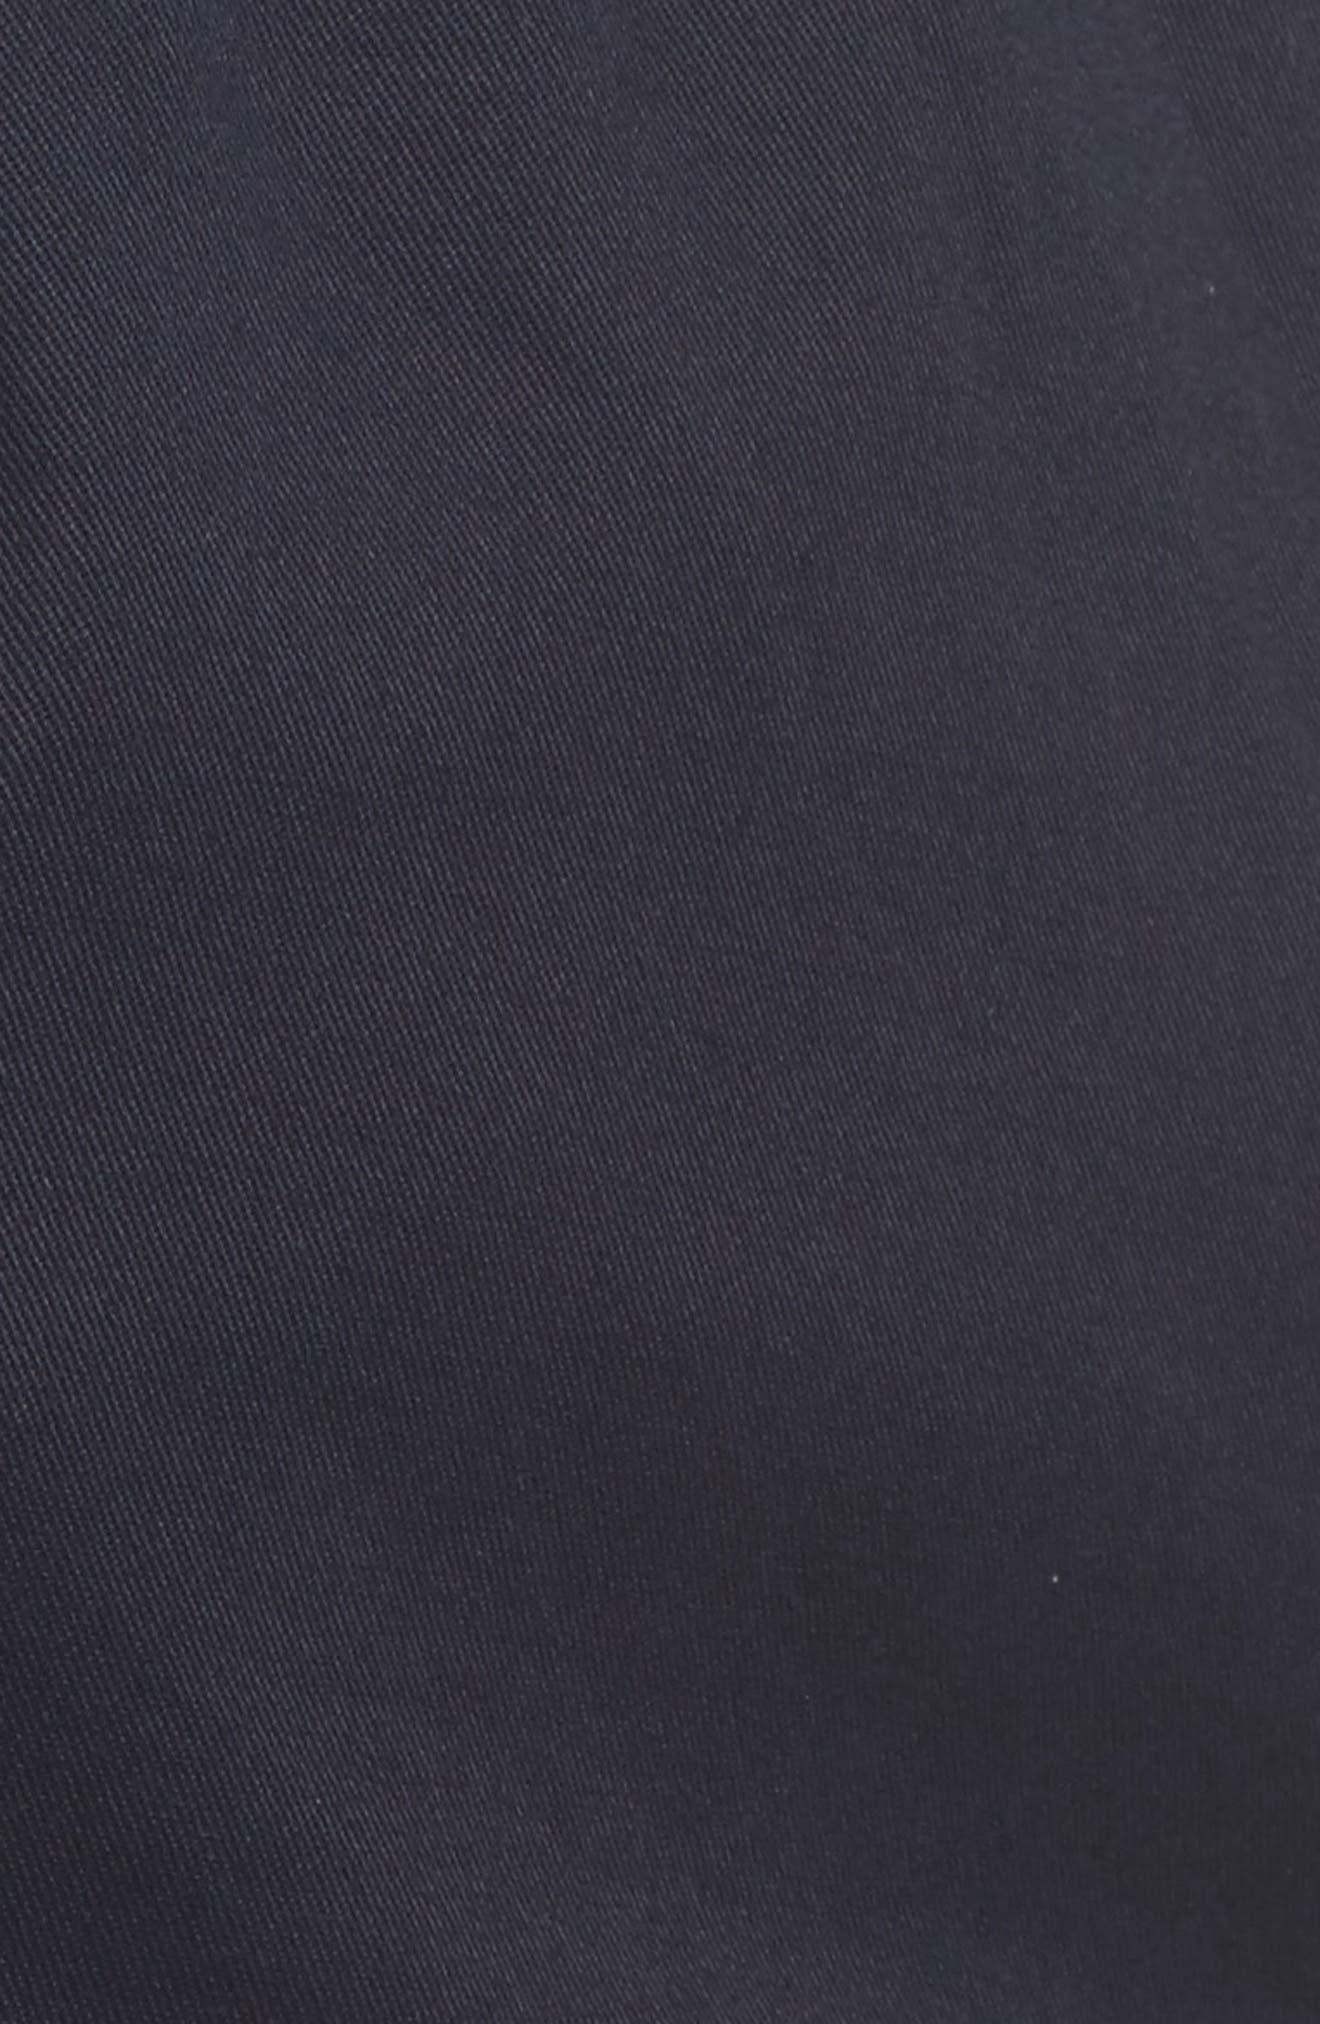 ZANEROBE,                             Salerno Stretch Woven Jogger Pants,                             Alternate thumbnail 5, color,                             NAVY